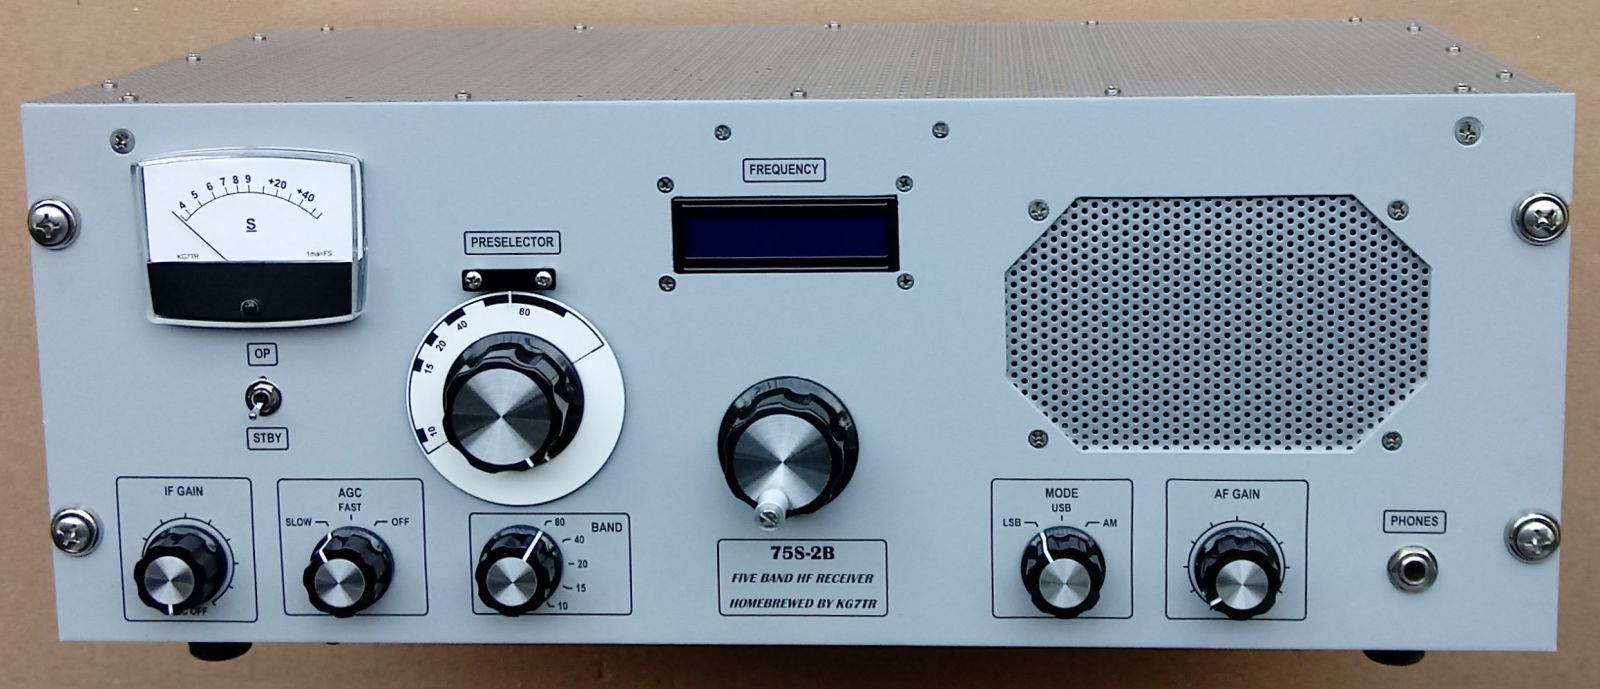 KG7TR - Callsign Lookup by QRZ Ham Radio